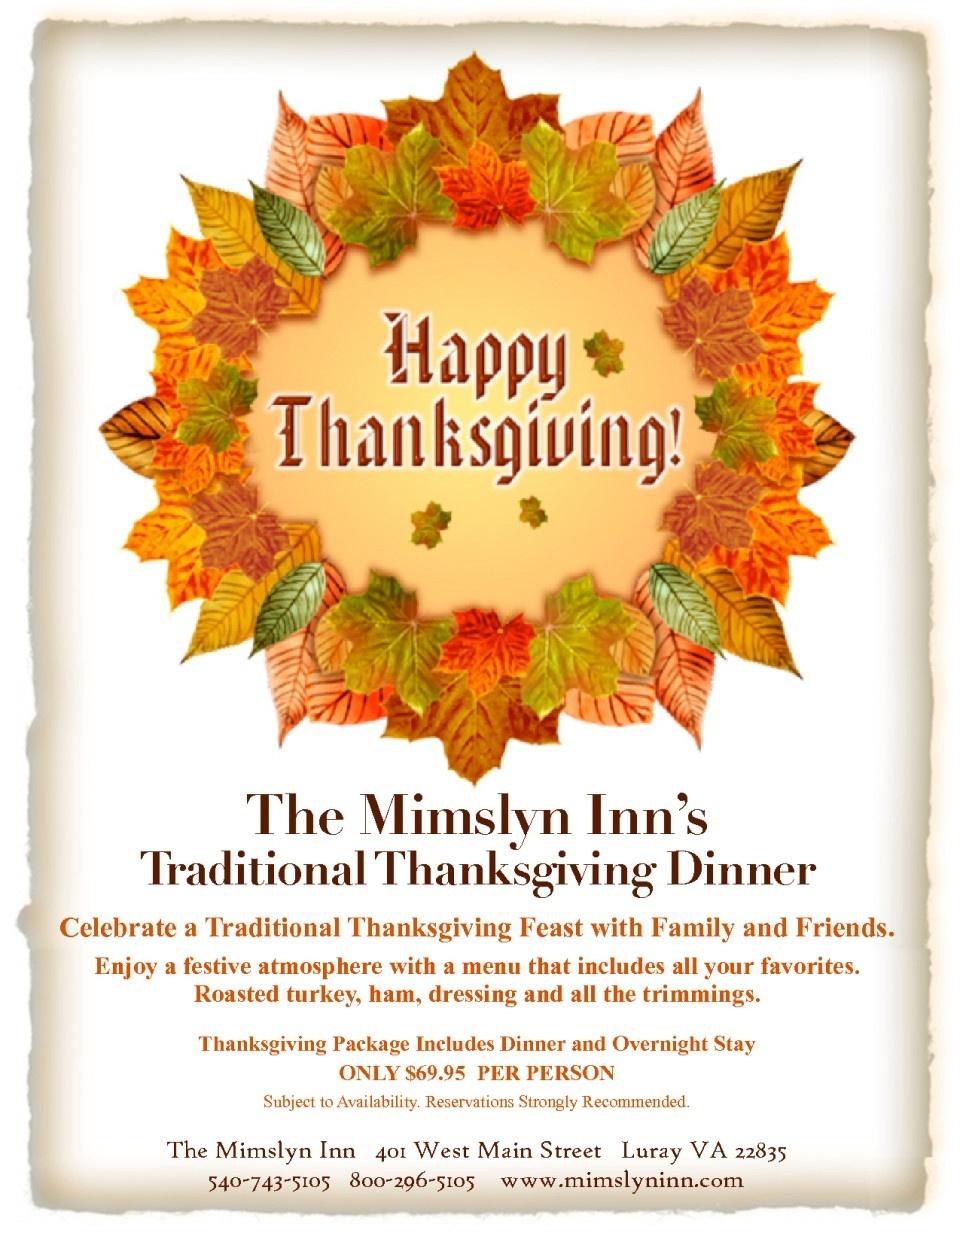 022 Free Thanksgiving Invitationteste Ideas Printable Of Postcard - Free Printable Thanksgiving Dinner Invitation Templates